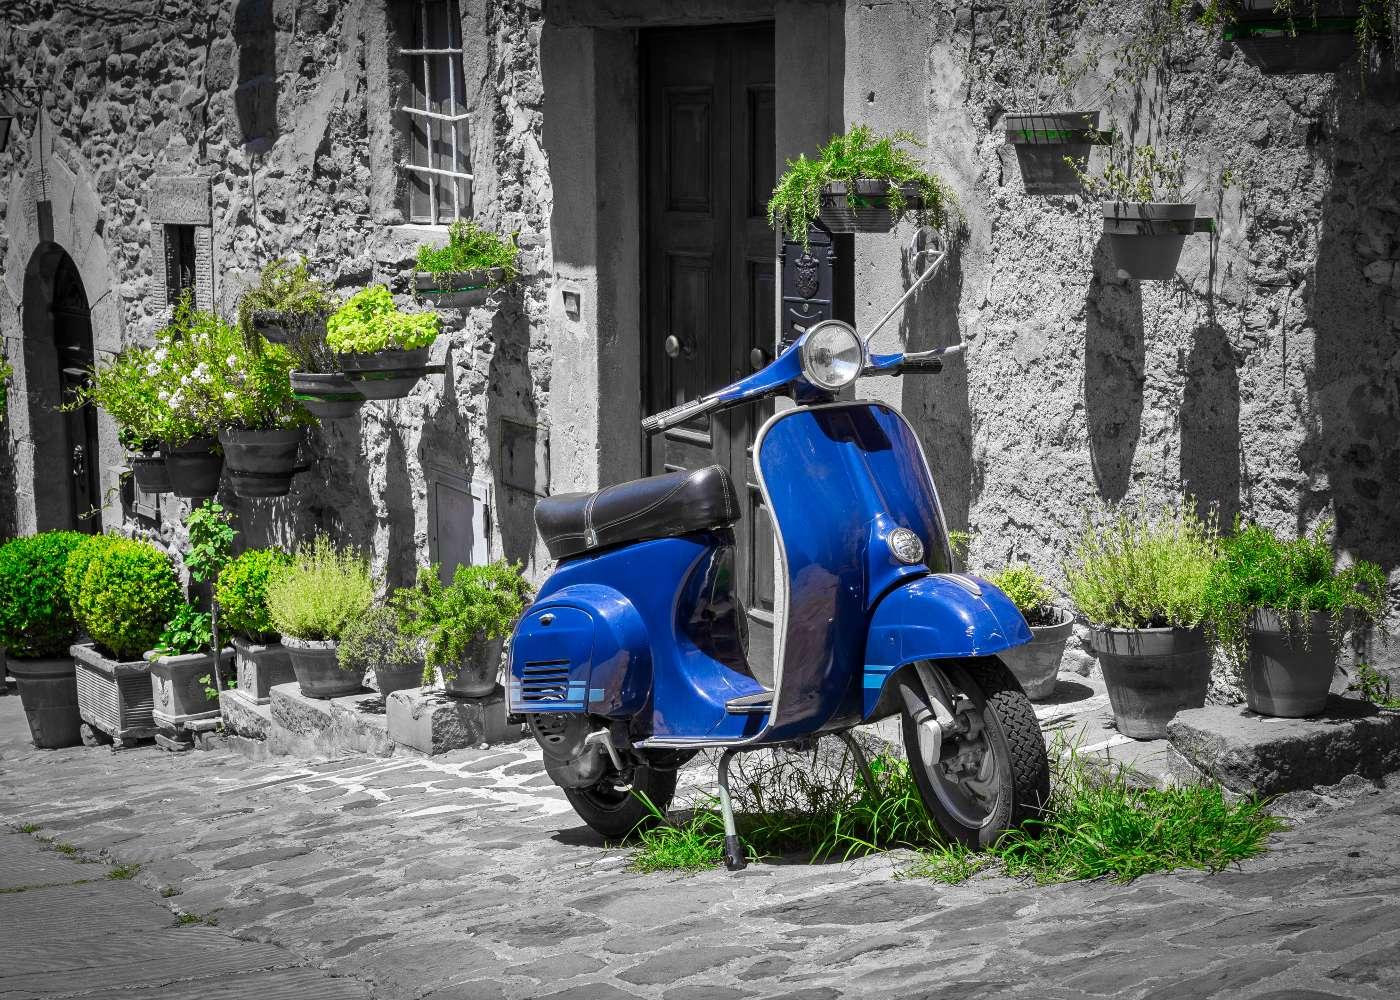 Piaggio na Toscana